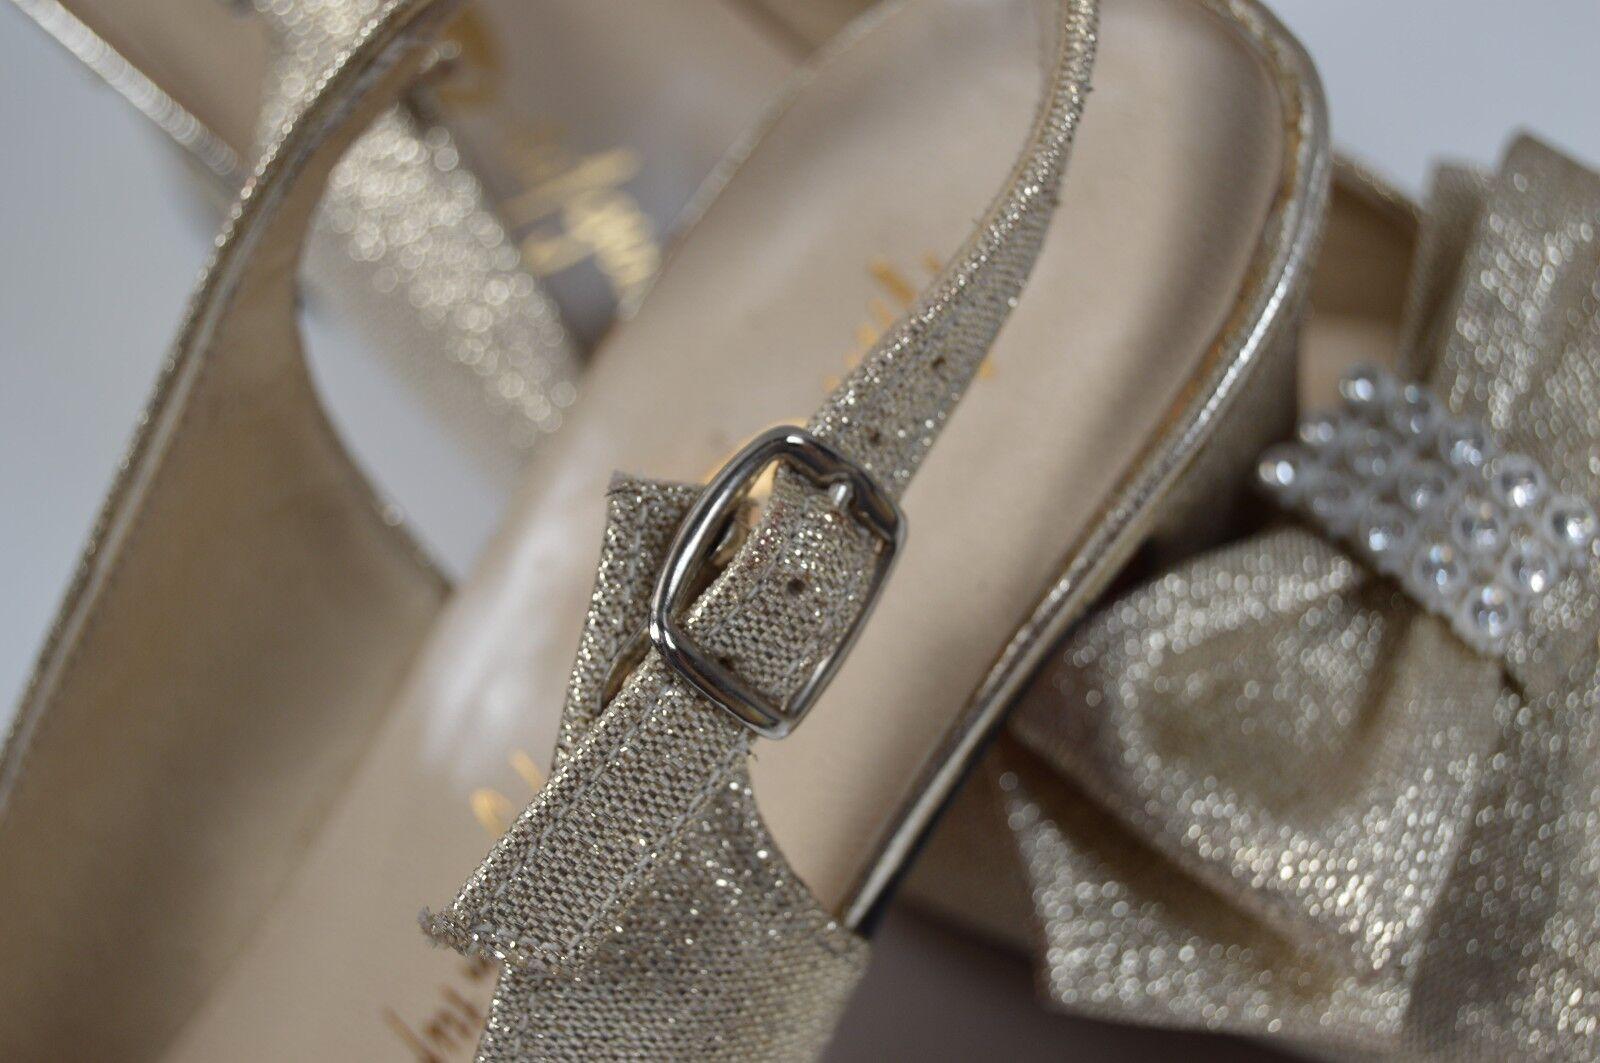 GÖRTZ Damen True Slingbacks Pumps NOS 70er True Damen Vintage 80s Sandalen gold block heel e49cb4